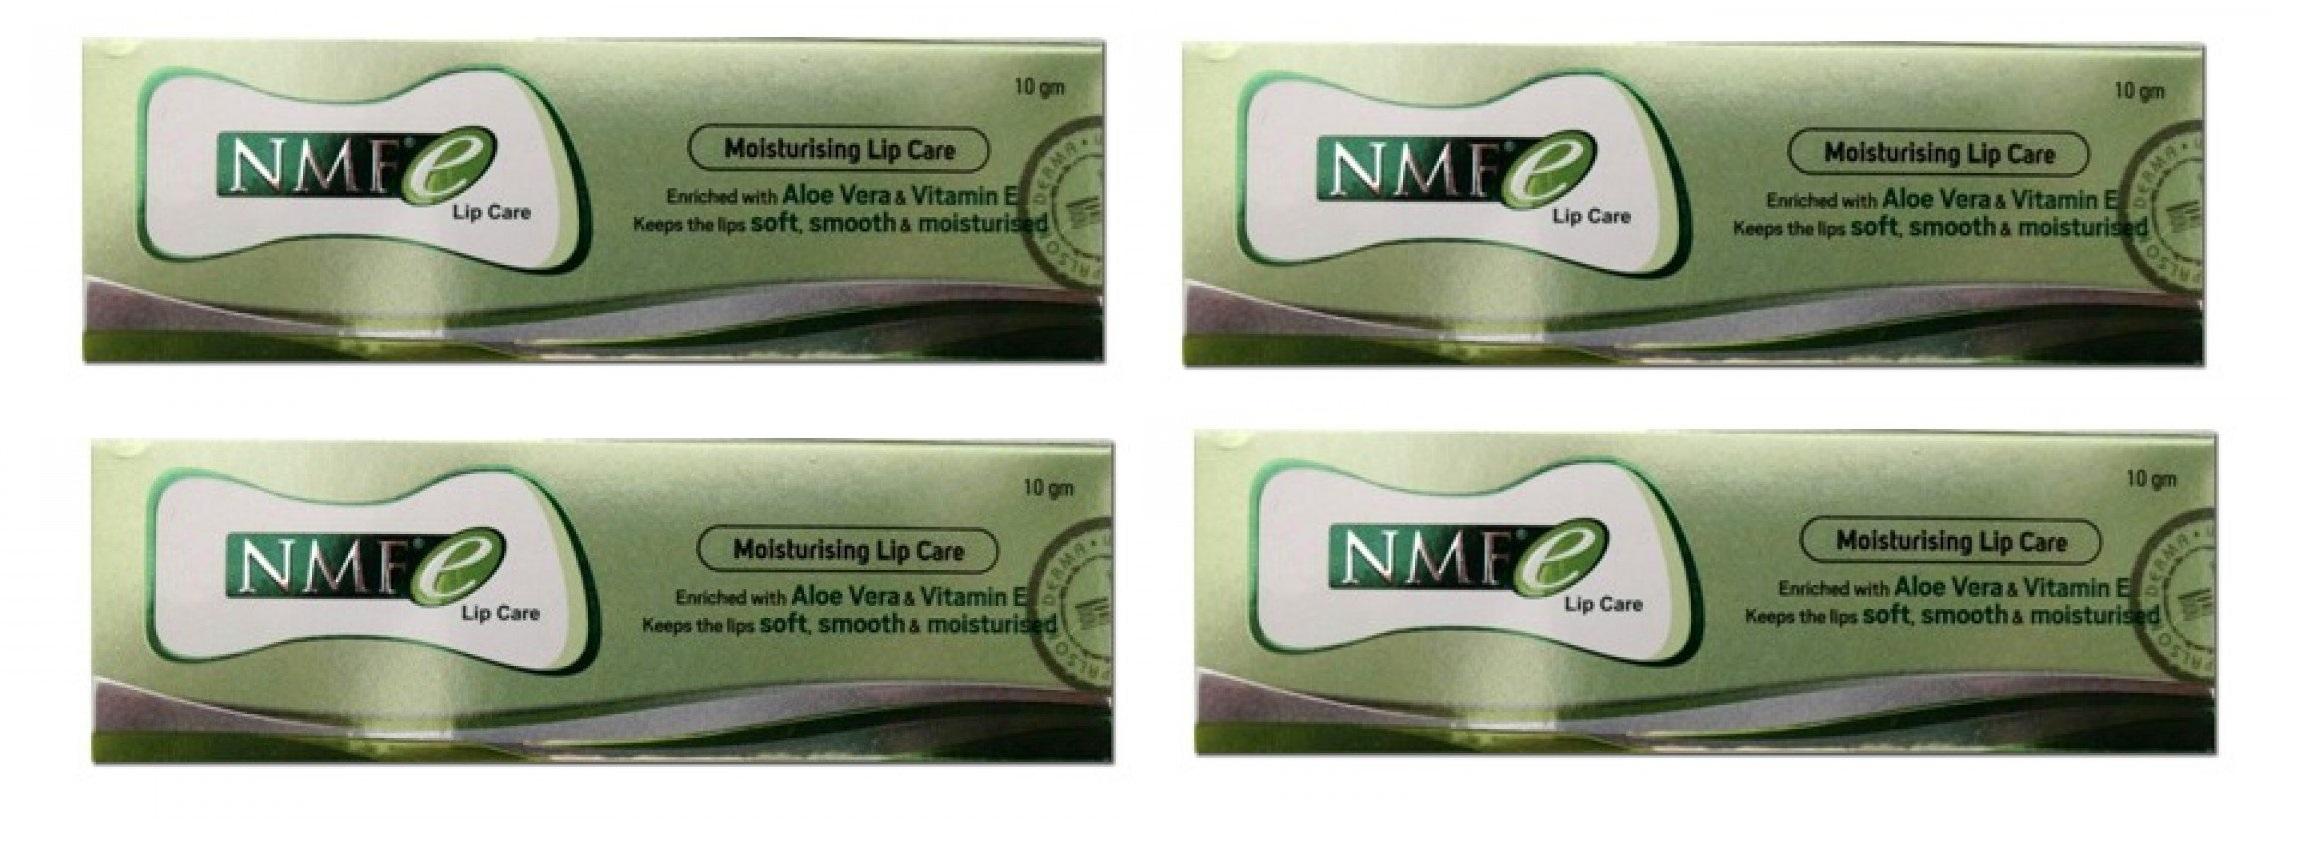 NMFe Nmf E Lip Care Balm 10 Gm Pack Of 4